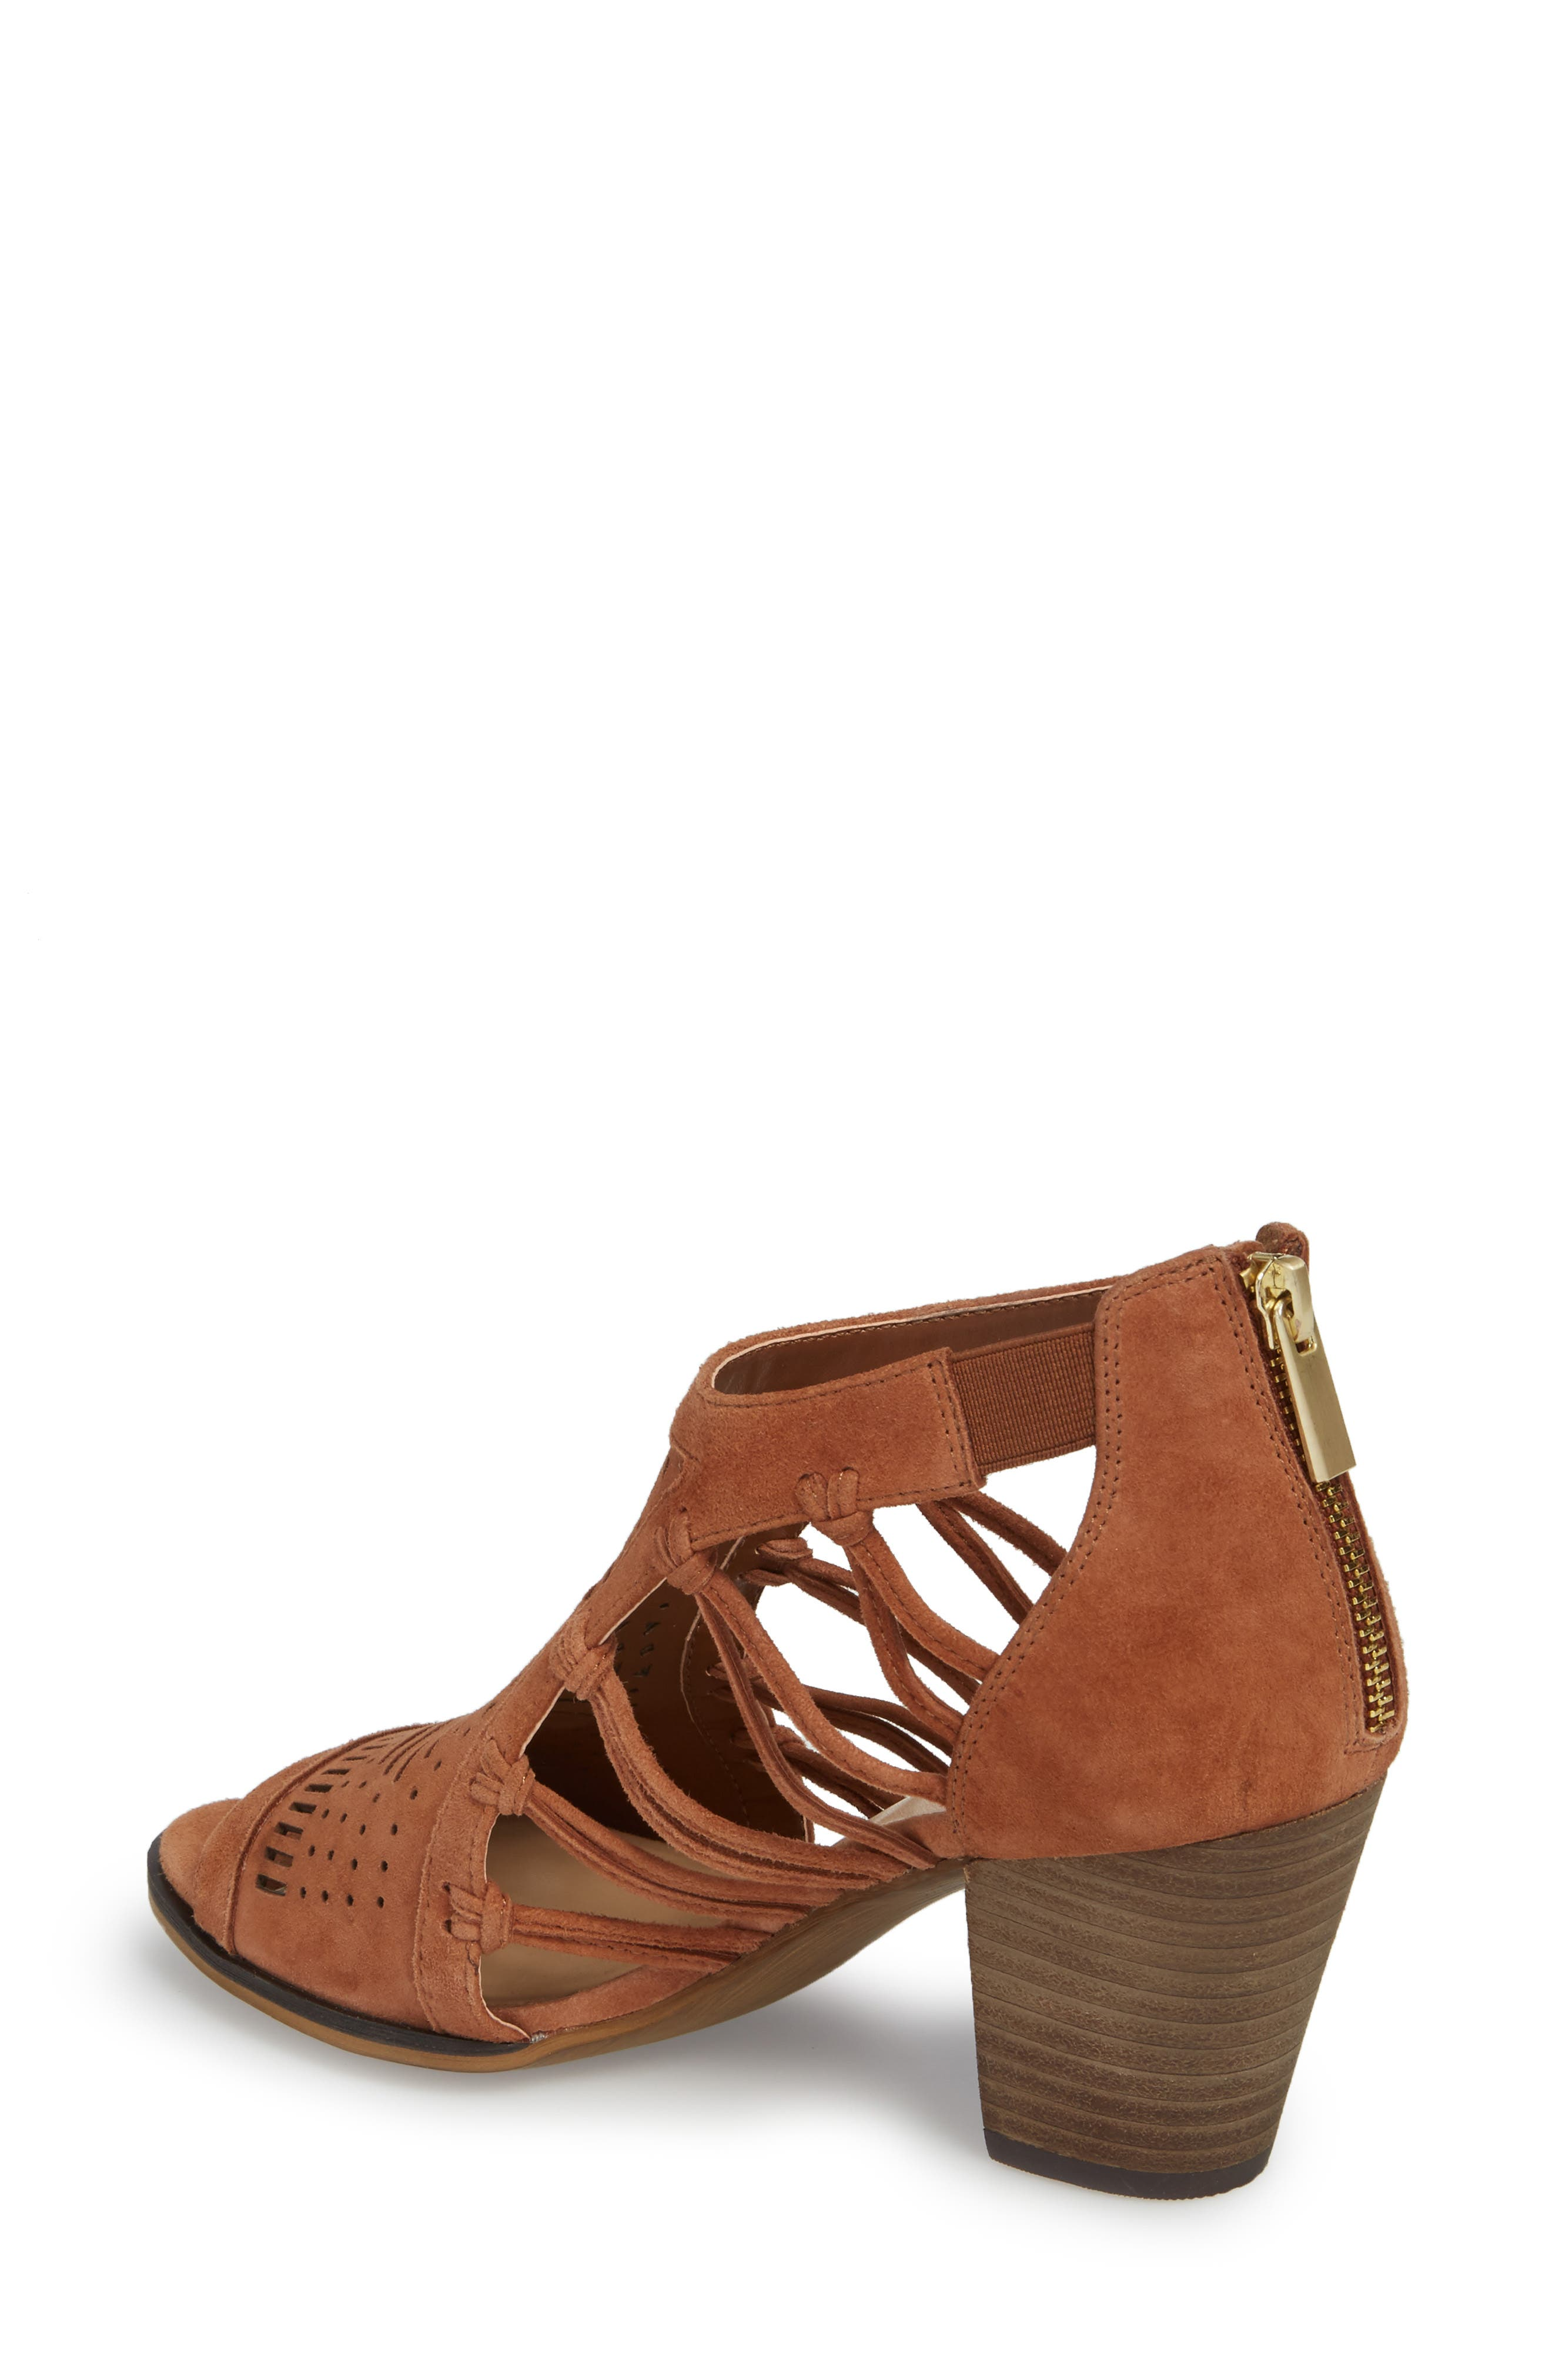 Kortez Block Heel Sandal,                             Alternate thumbnail 2, color,                             Dark Tan Suede